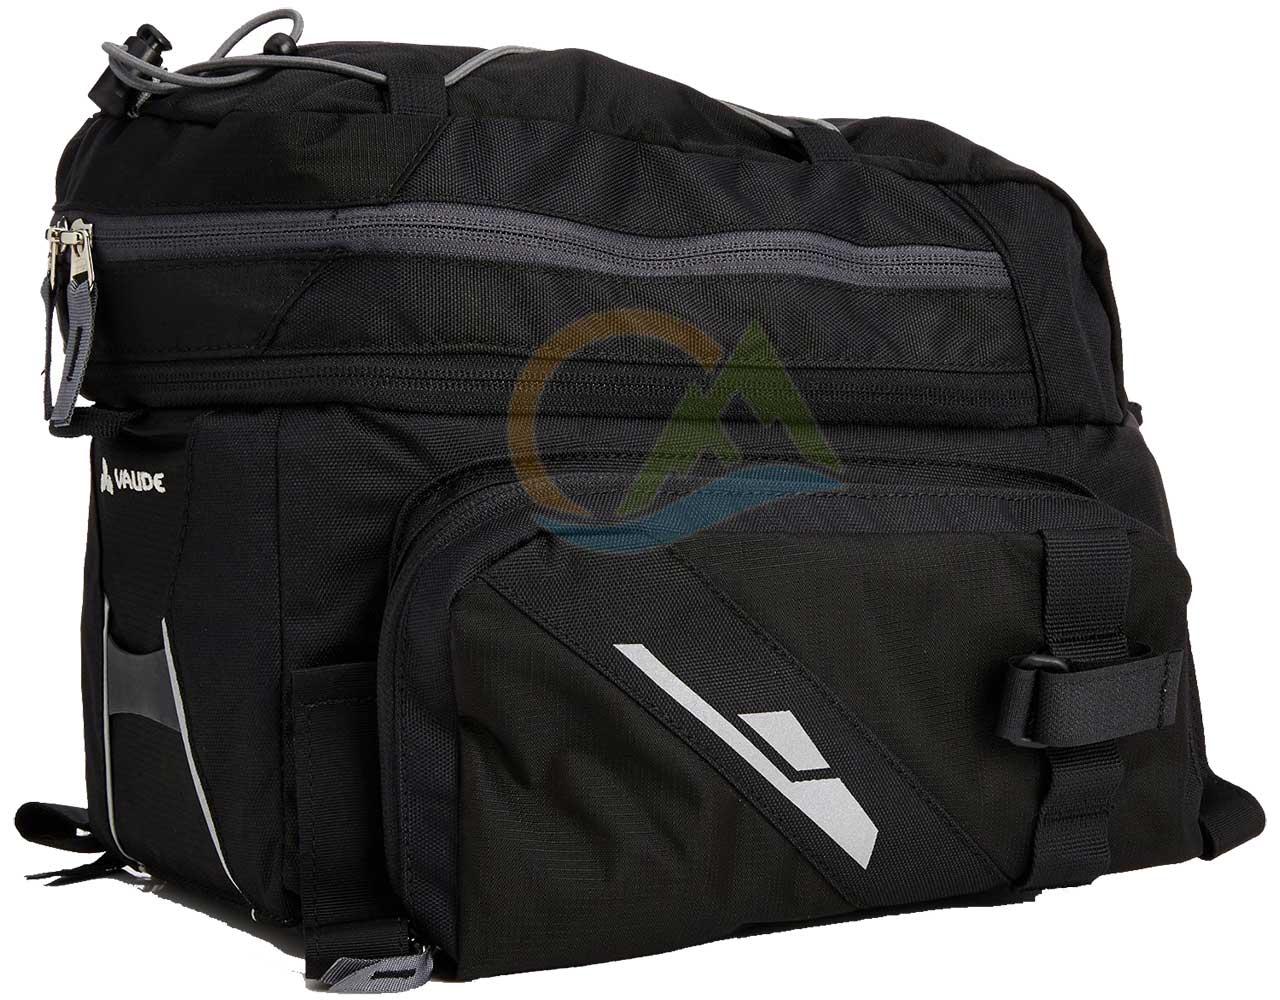 Vaude Silkroad Plus bisiklet tur çantası